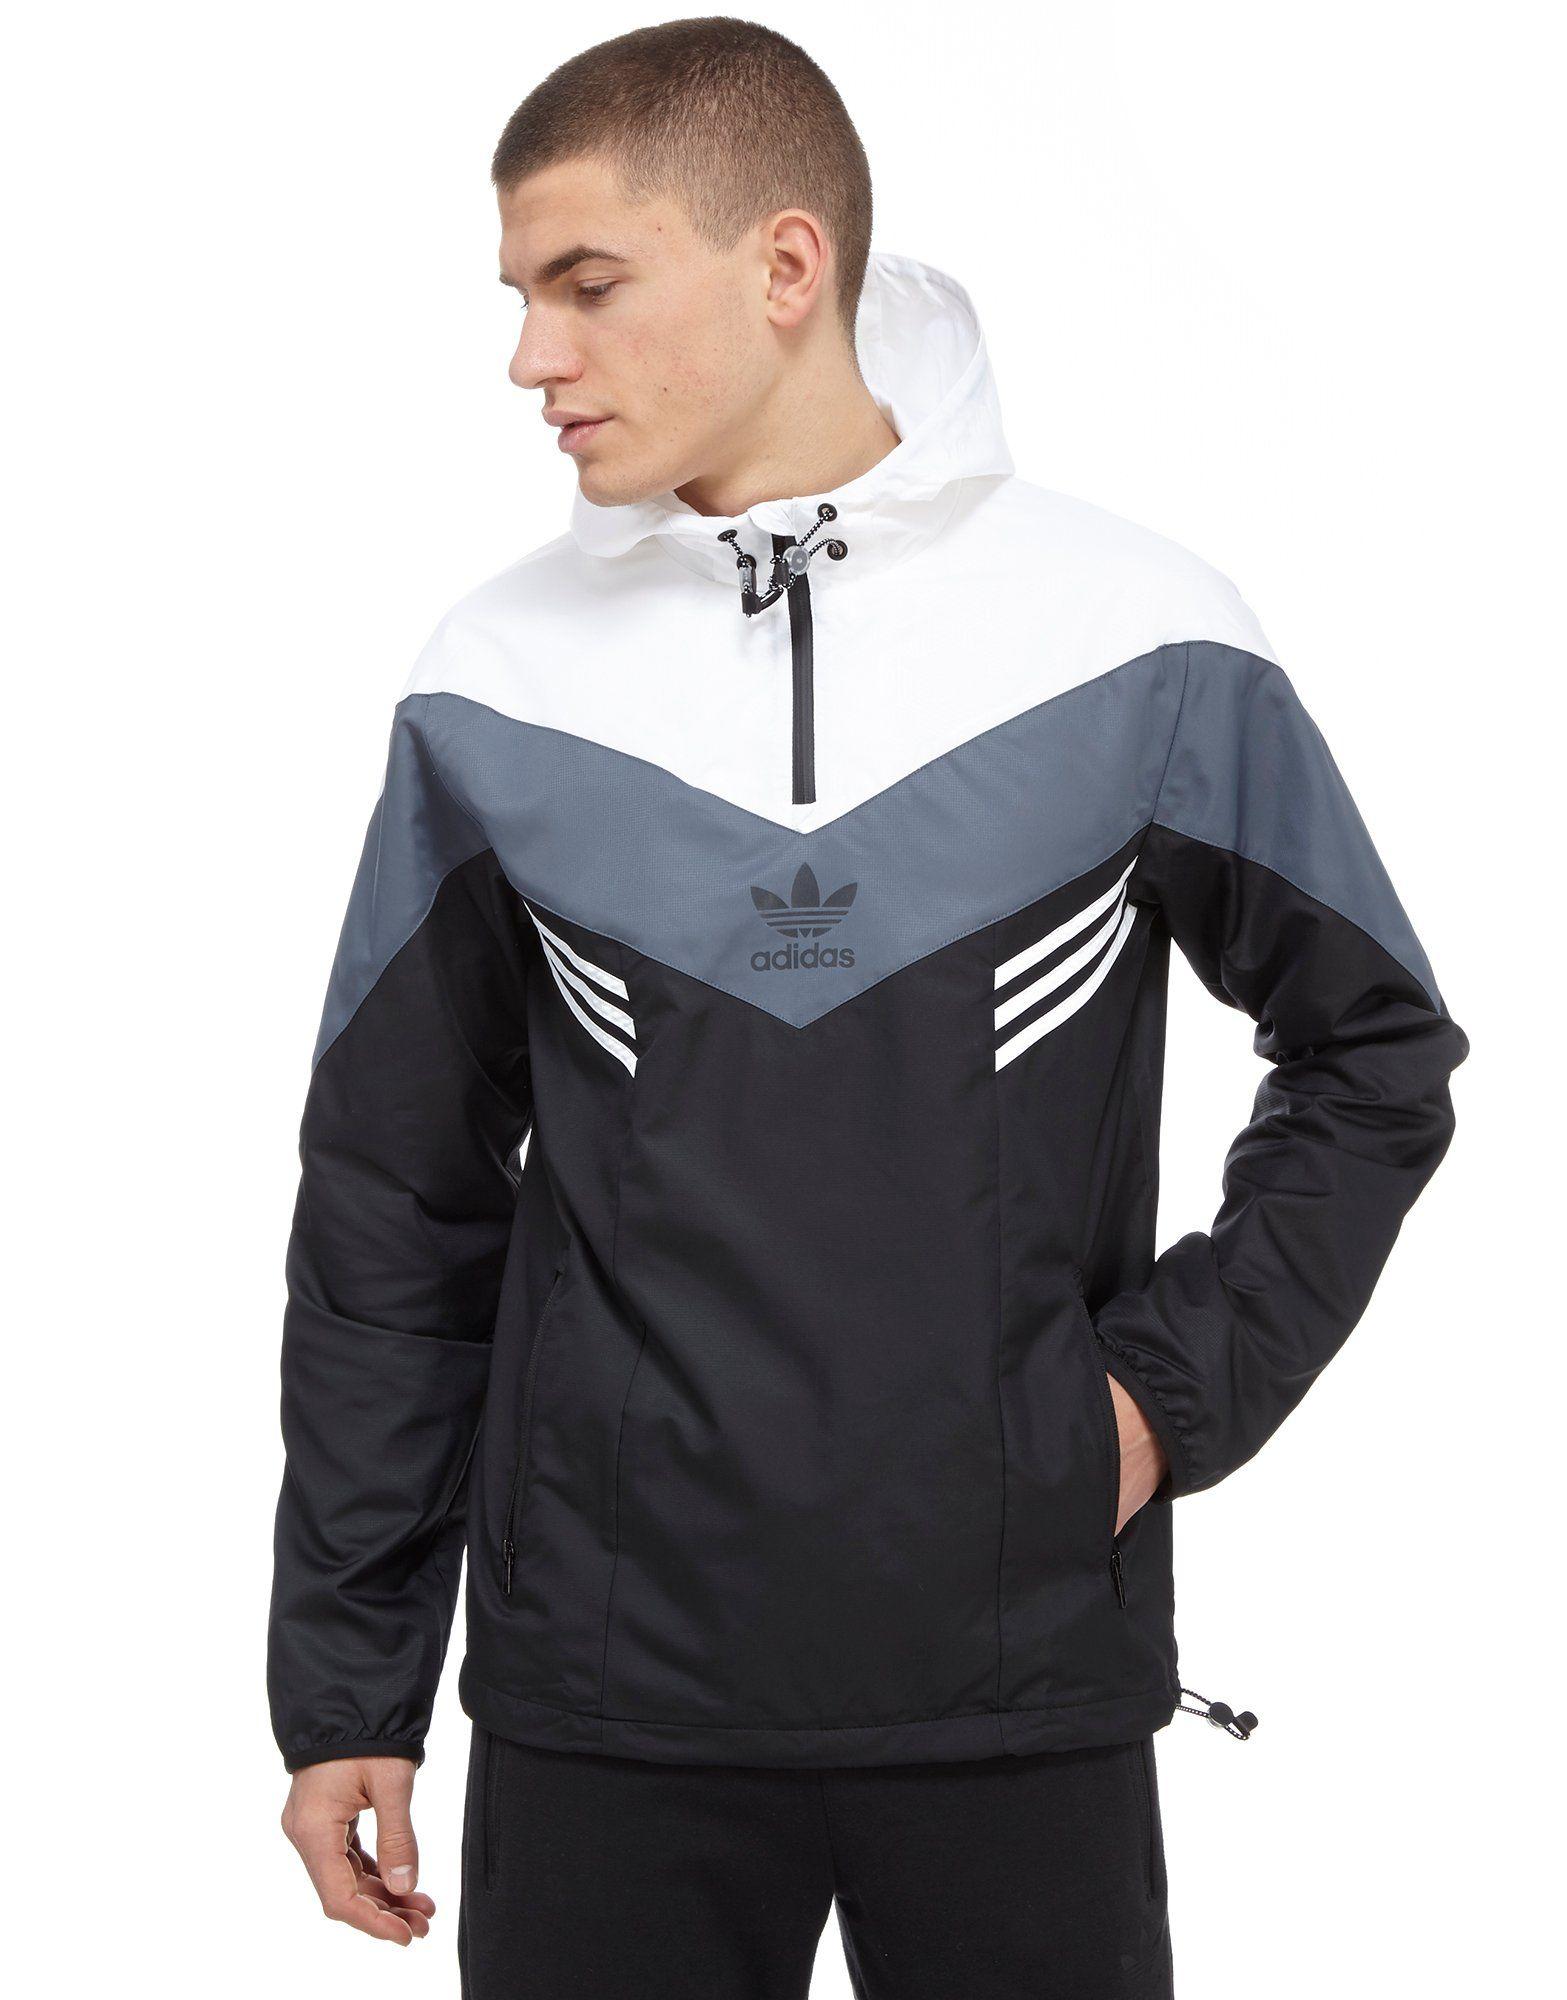 Adidas jacket - 1 Review Adidas Originals Street Run 1 2 Zip Jacket